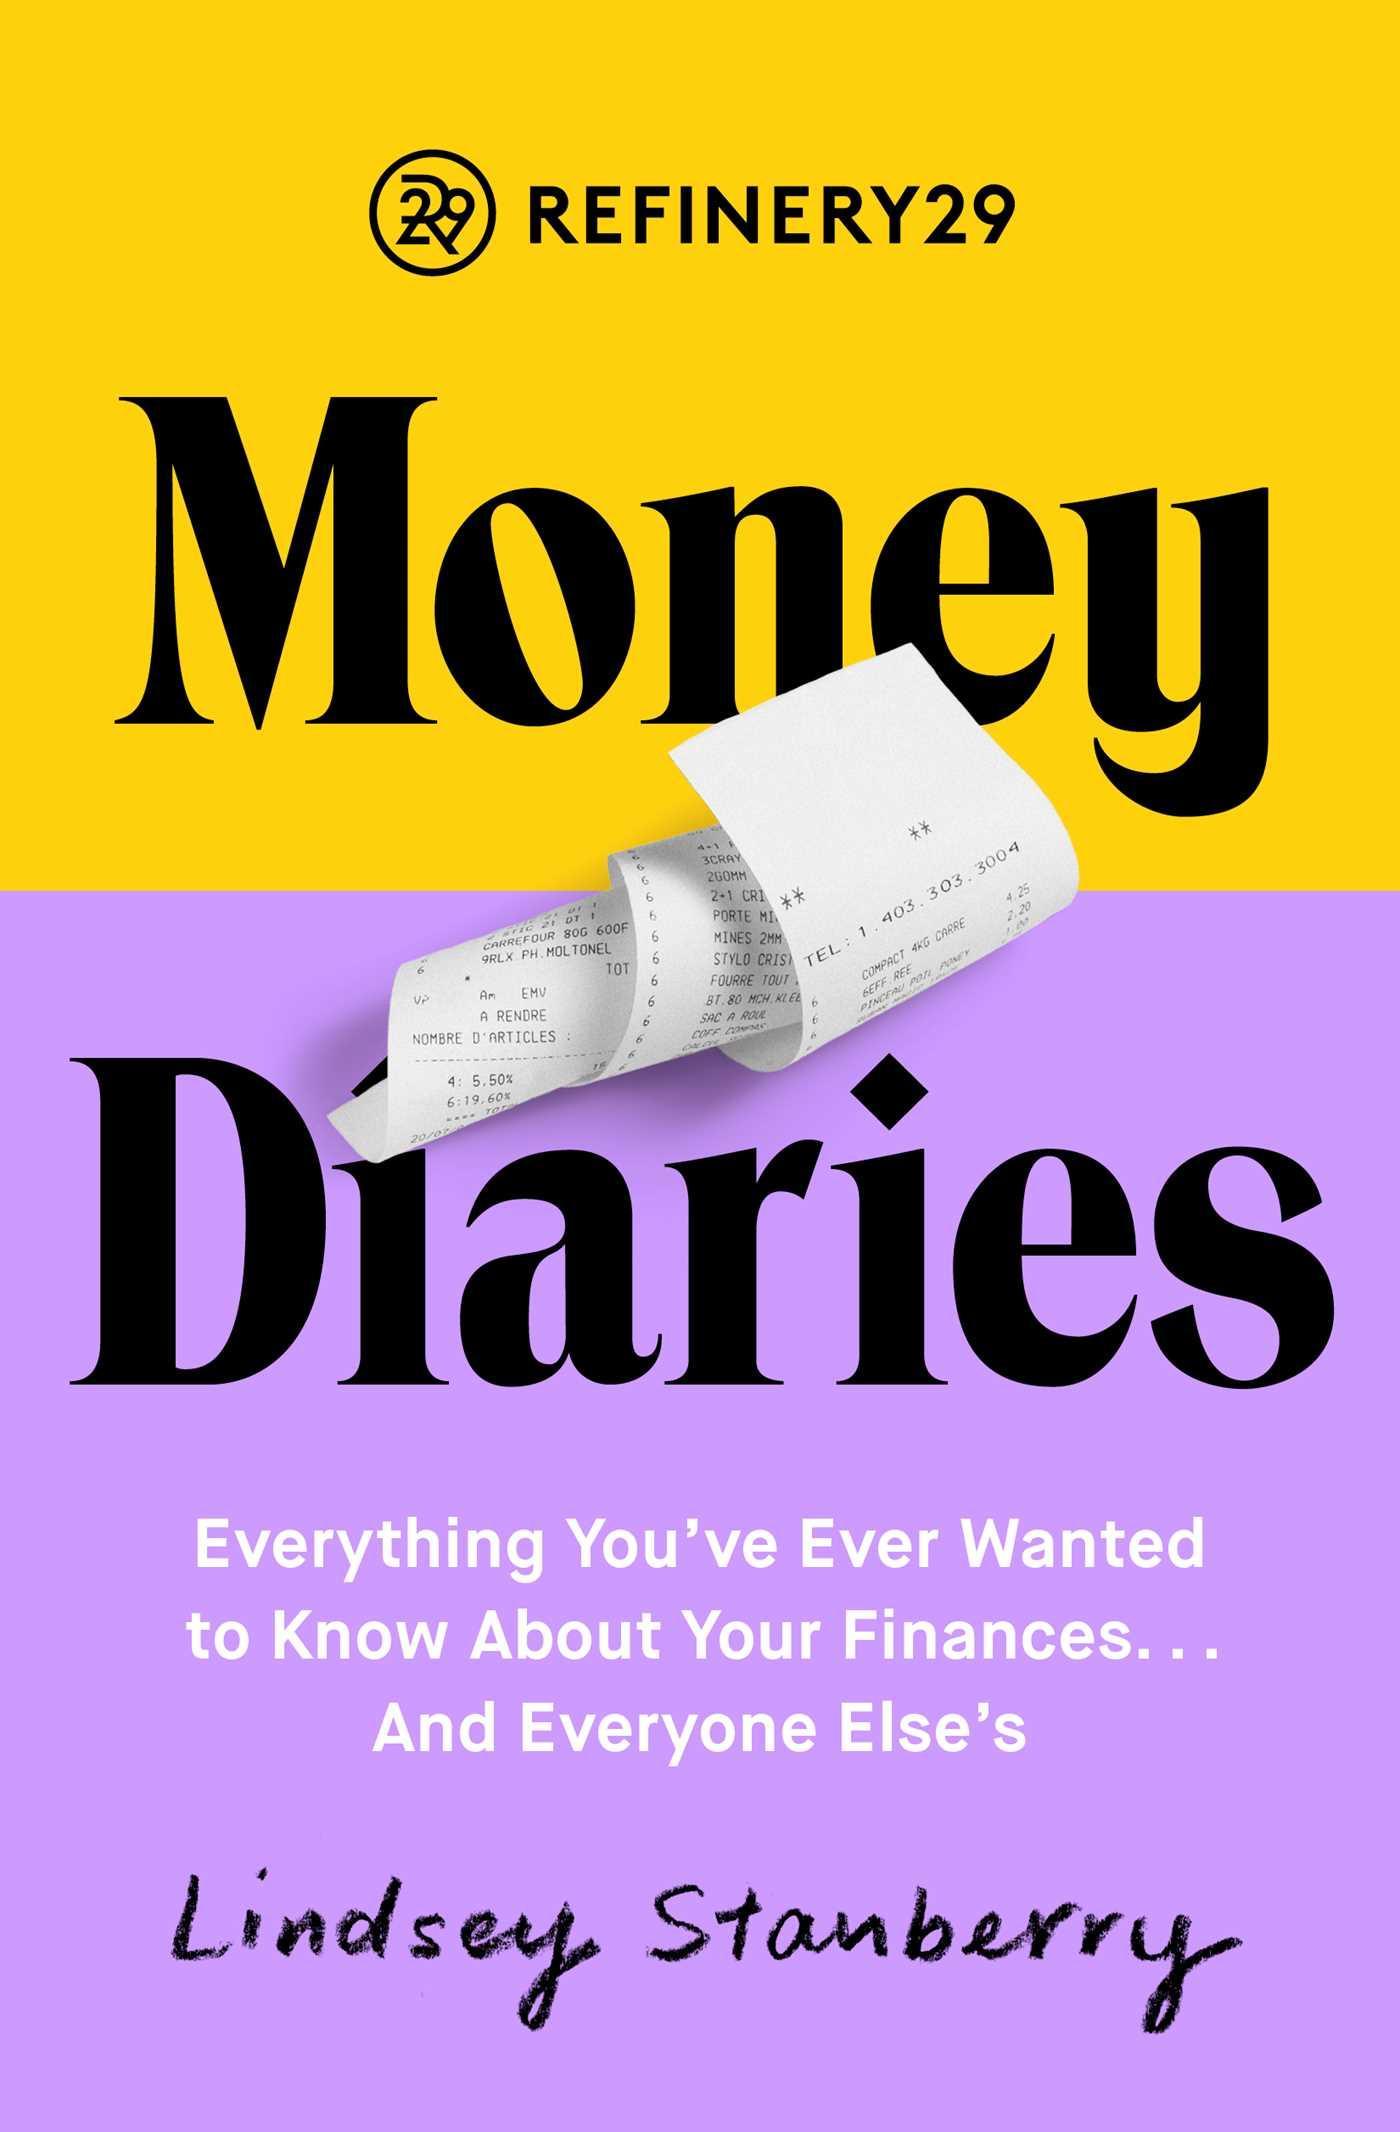 Money Diaries' Aims to Help Women Take Control of Their Finances